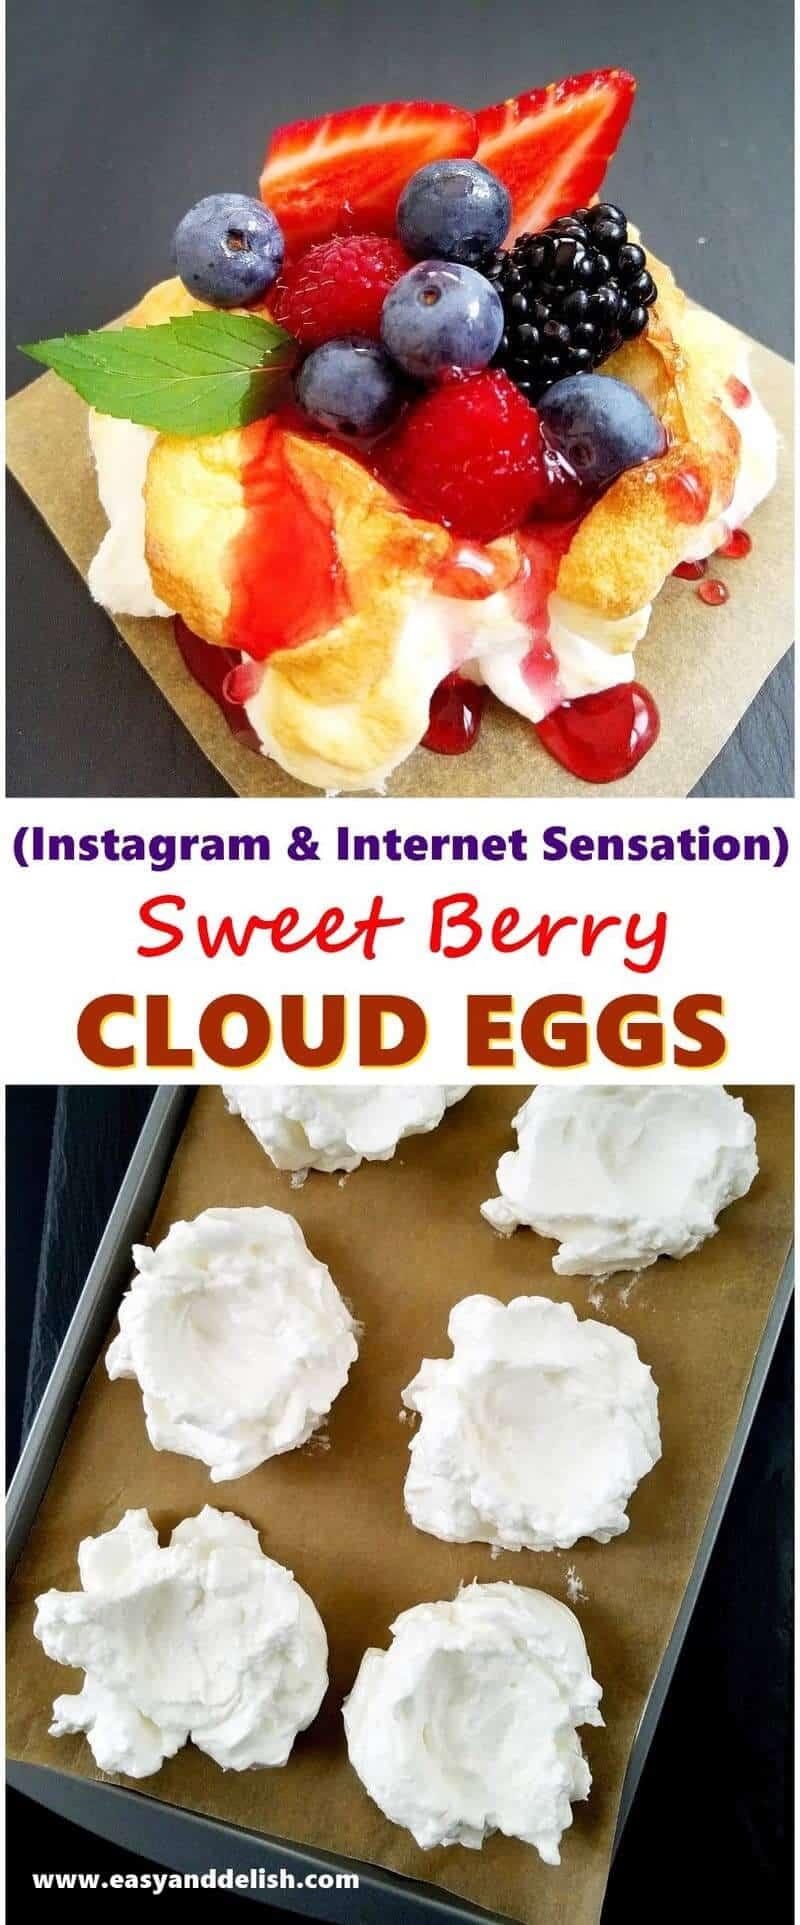 Sweet-berry-cloud-eggs